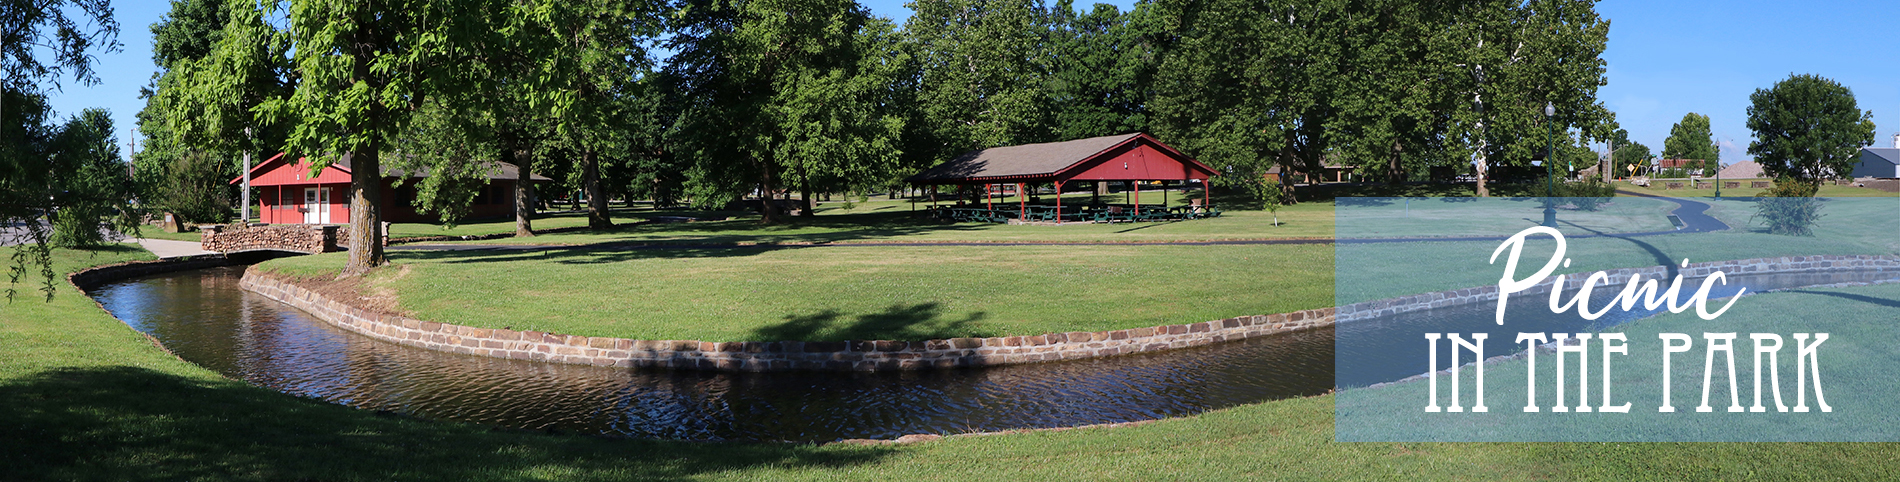 Lamar Mo City Park - Picnic In The Park 2021